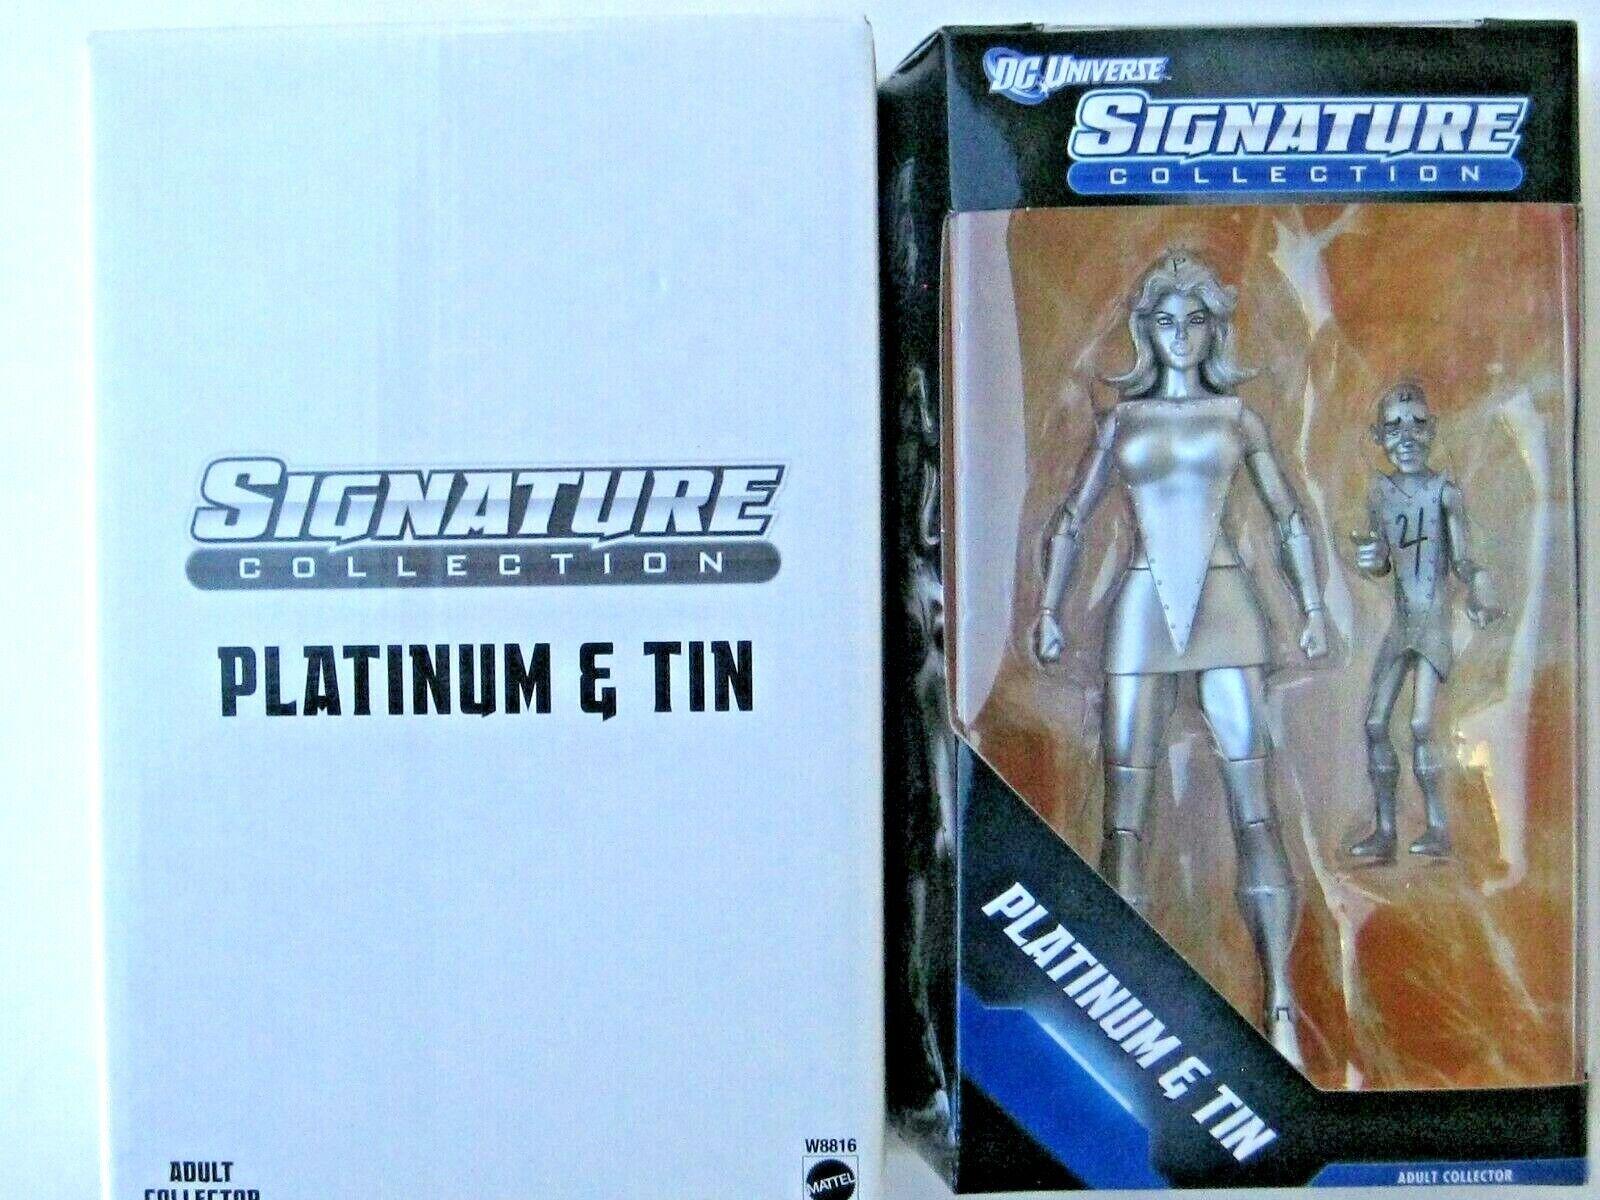 2012 DC Universe Signature Collection Platinum & Tin